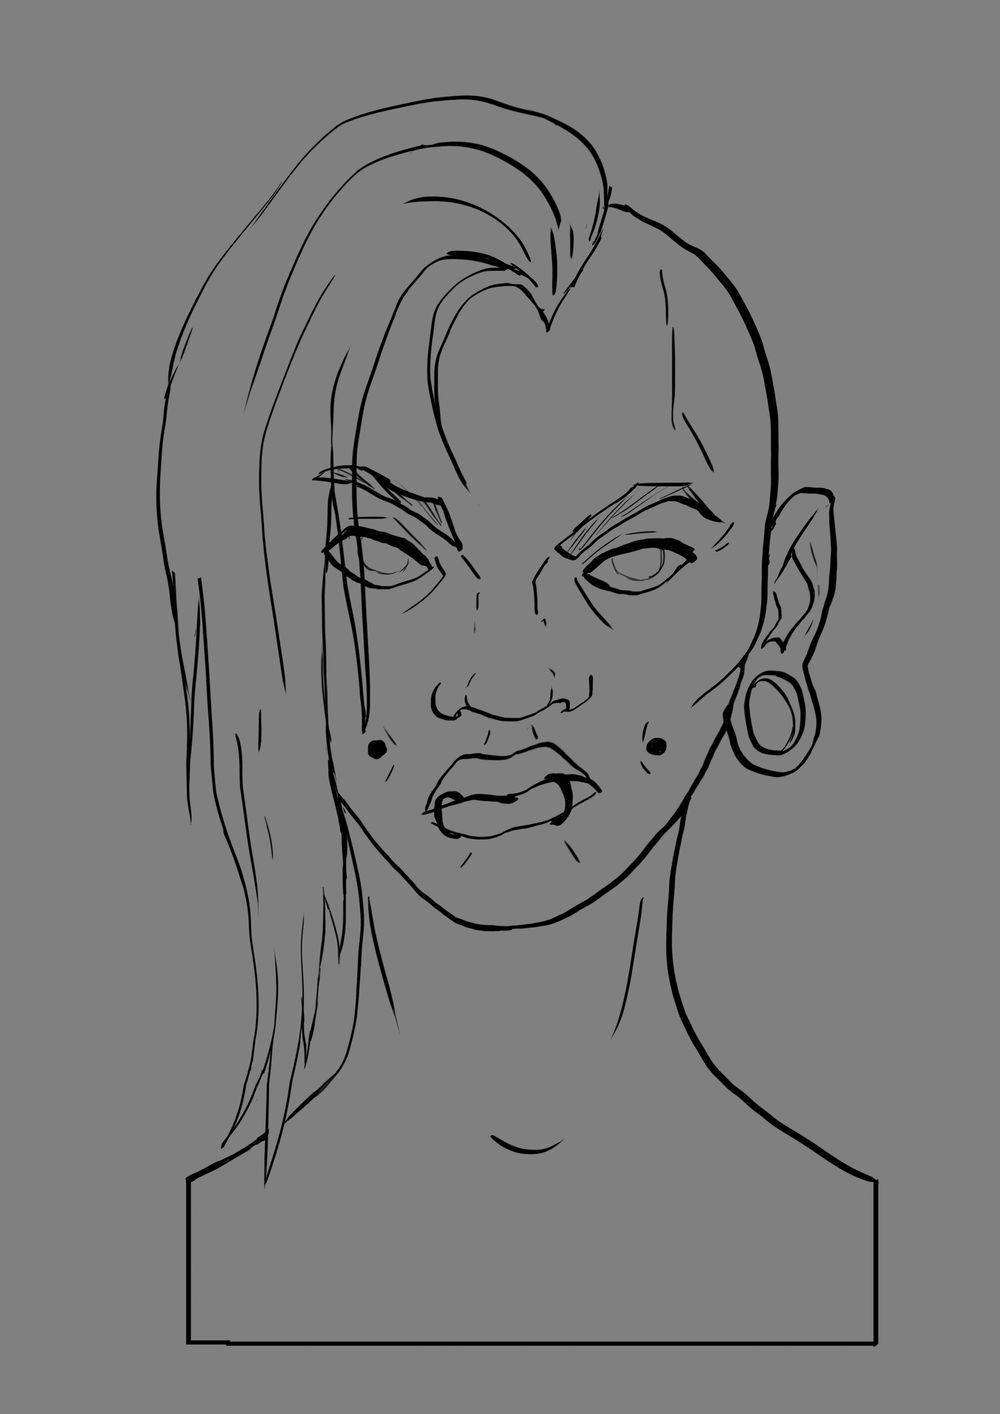 Head Study (Male, Female, Villain, Punk Girl, Buddy) - image 13 - student project